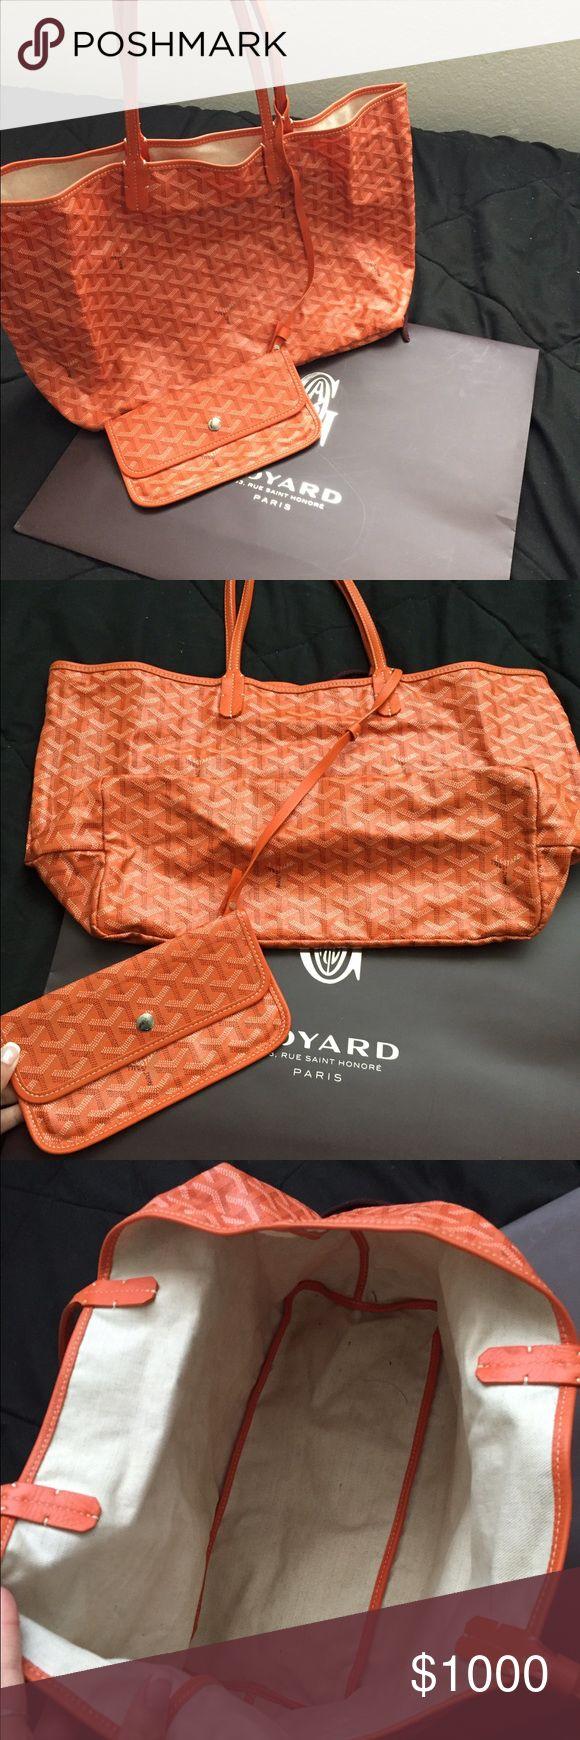 Goyard orange bag Beautiful and authentic large Goyard bag for everyday wear! Amazing condition! Goyard Bags Shoulder Bags